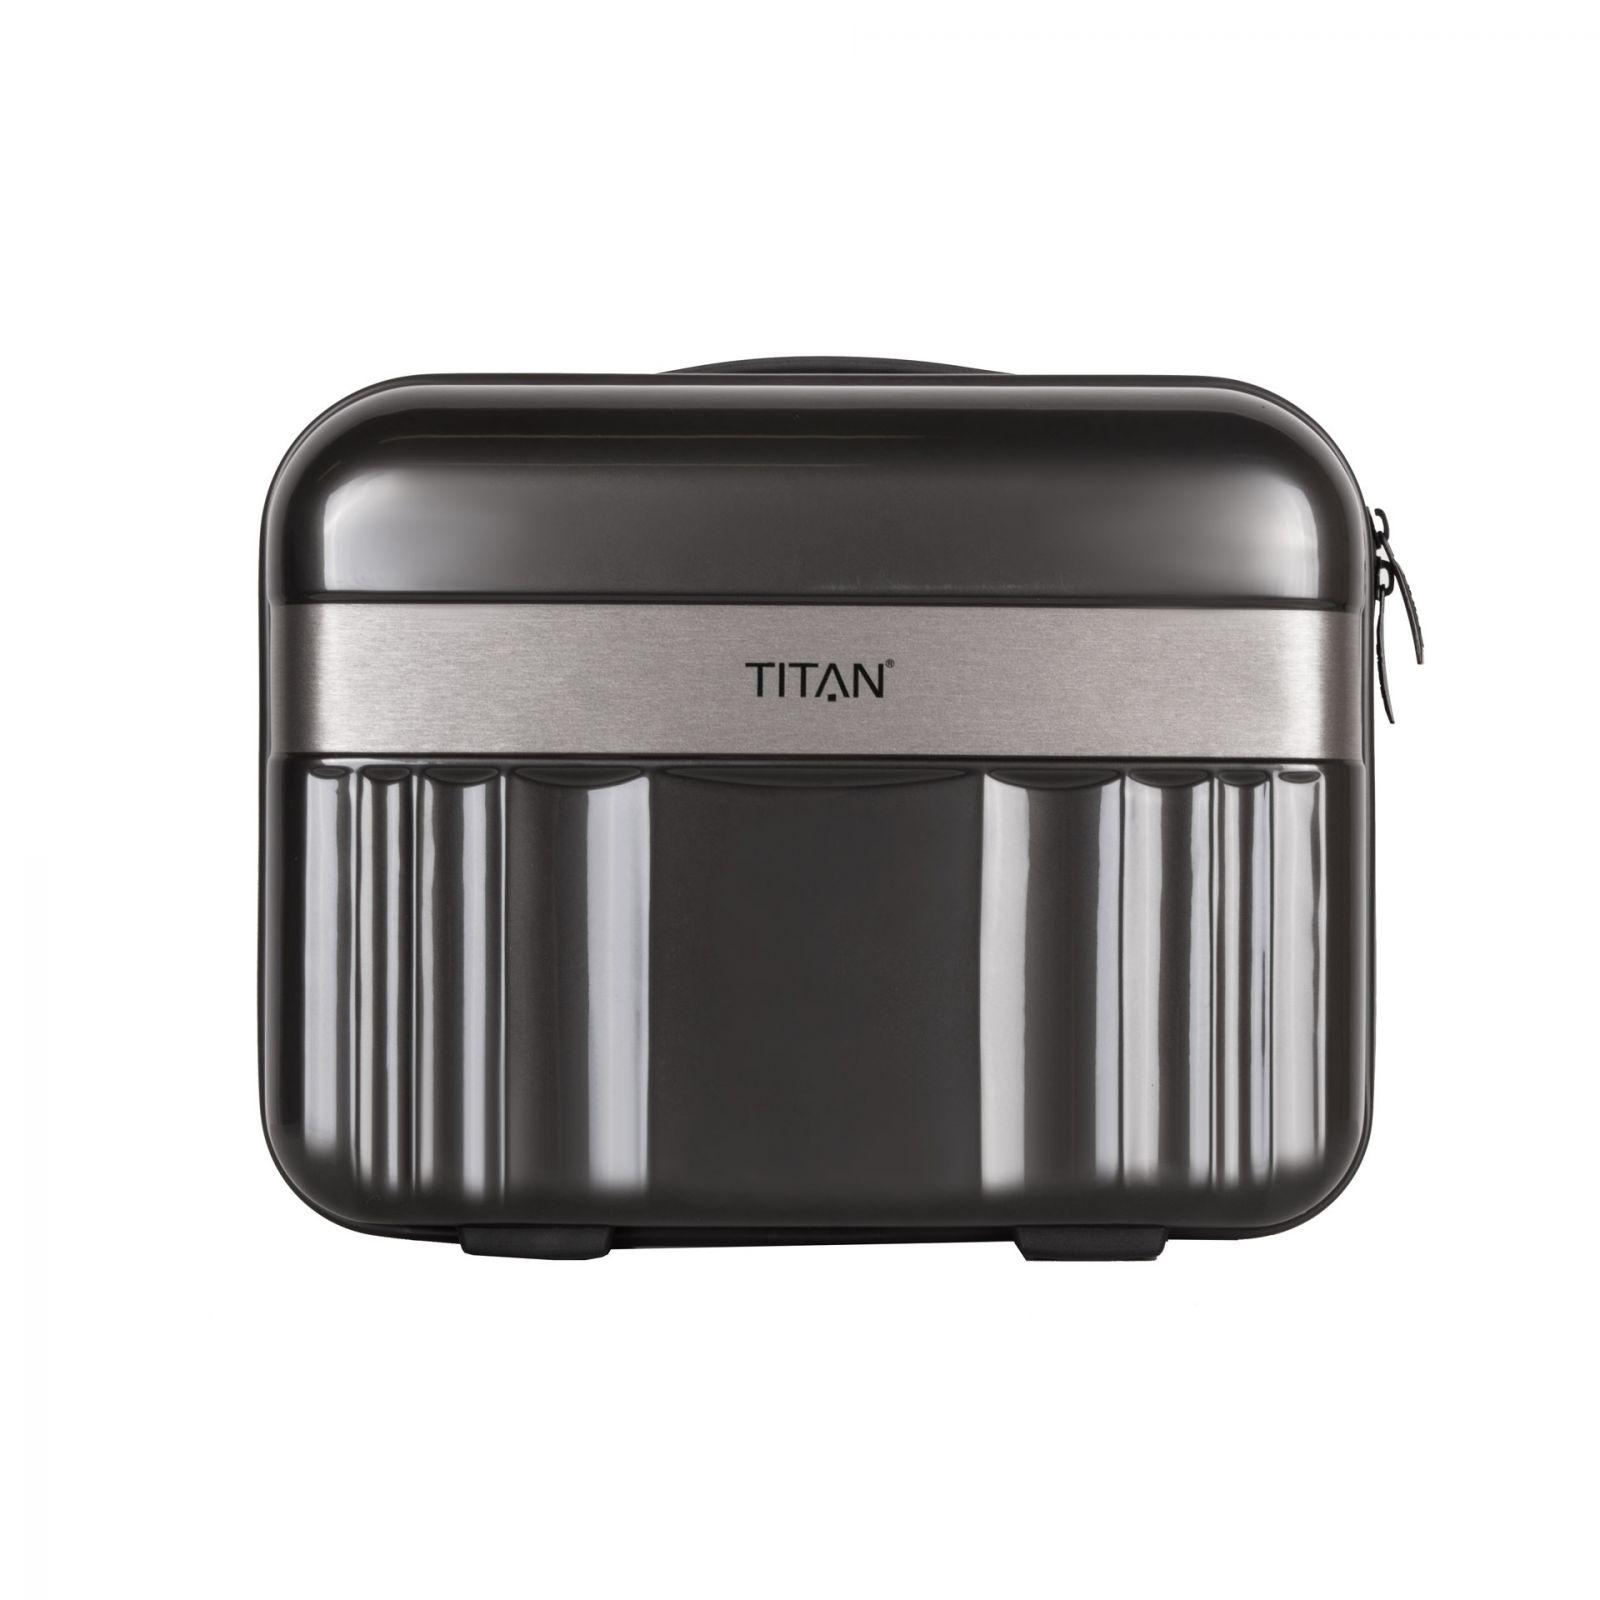 BB:TITAN-831702-04   Titan Spotlight Flash Beauty case Anthracite